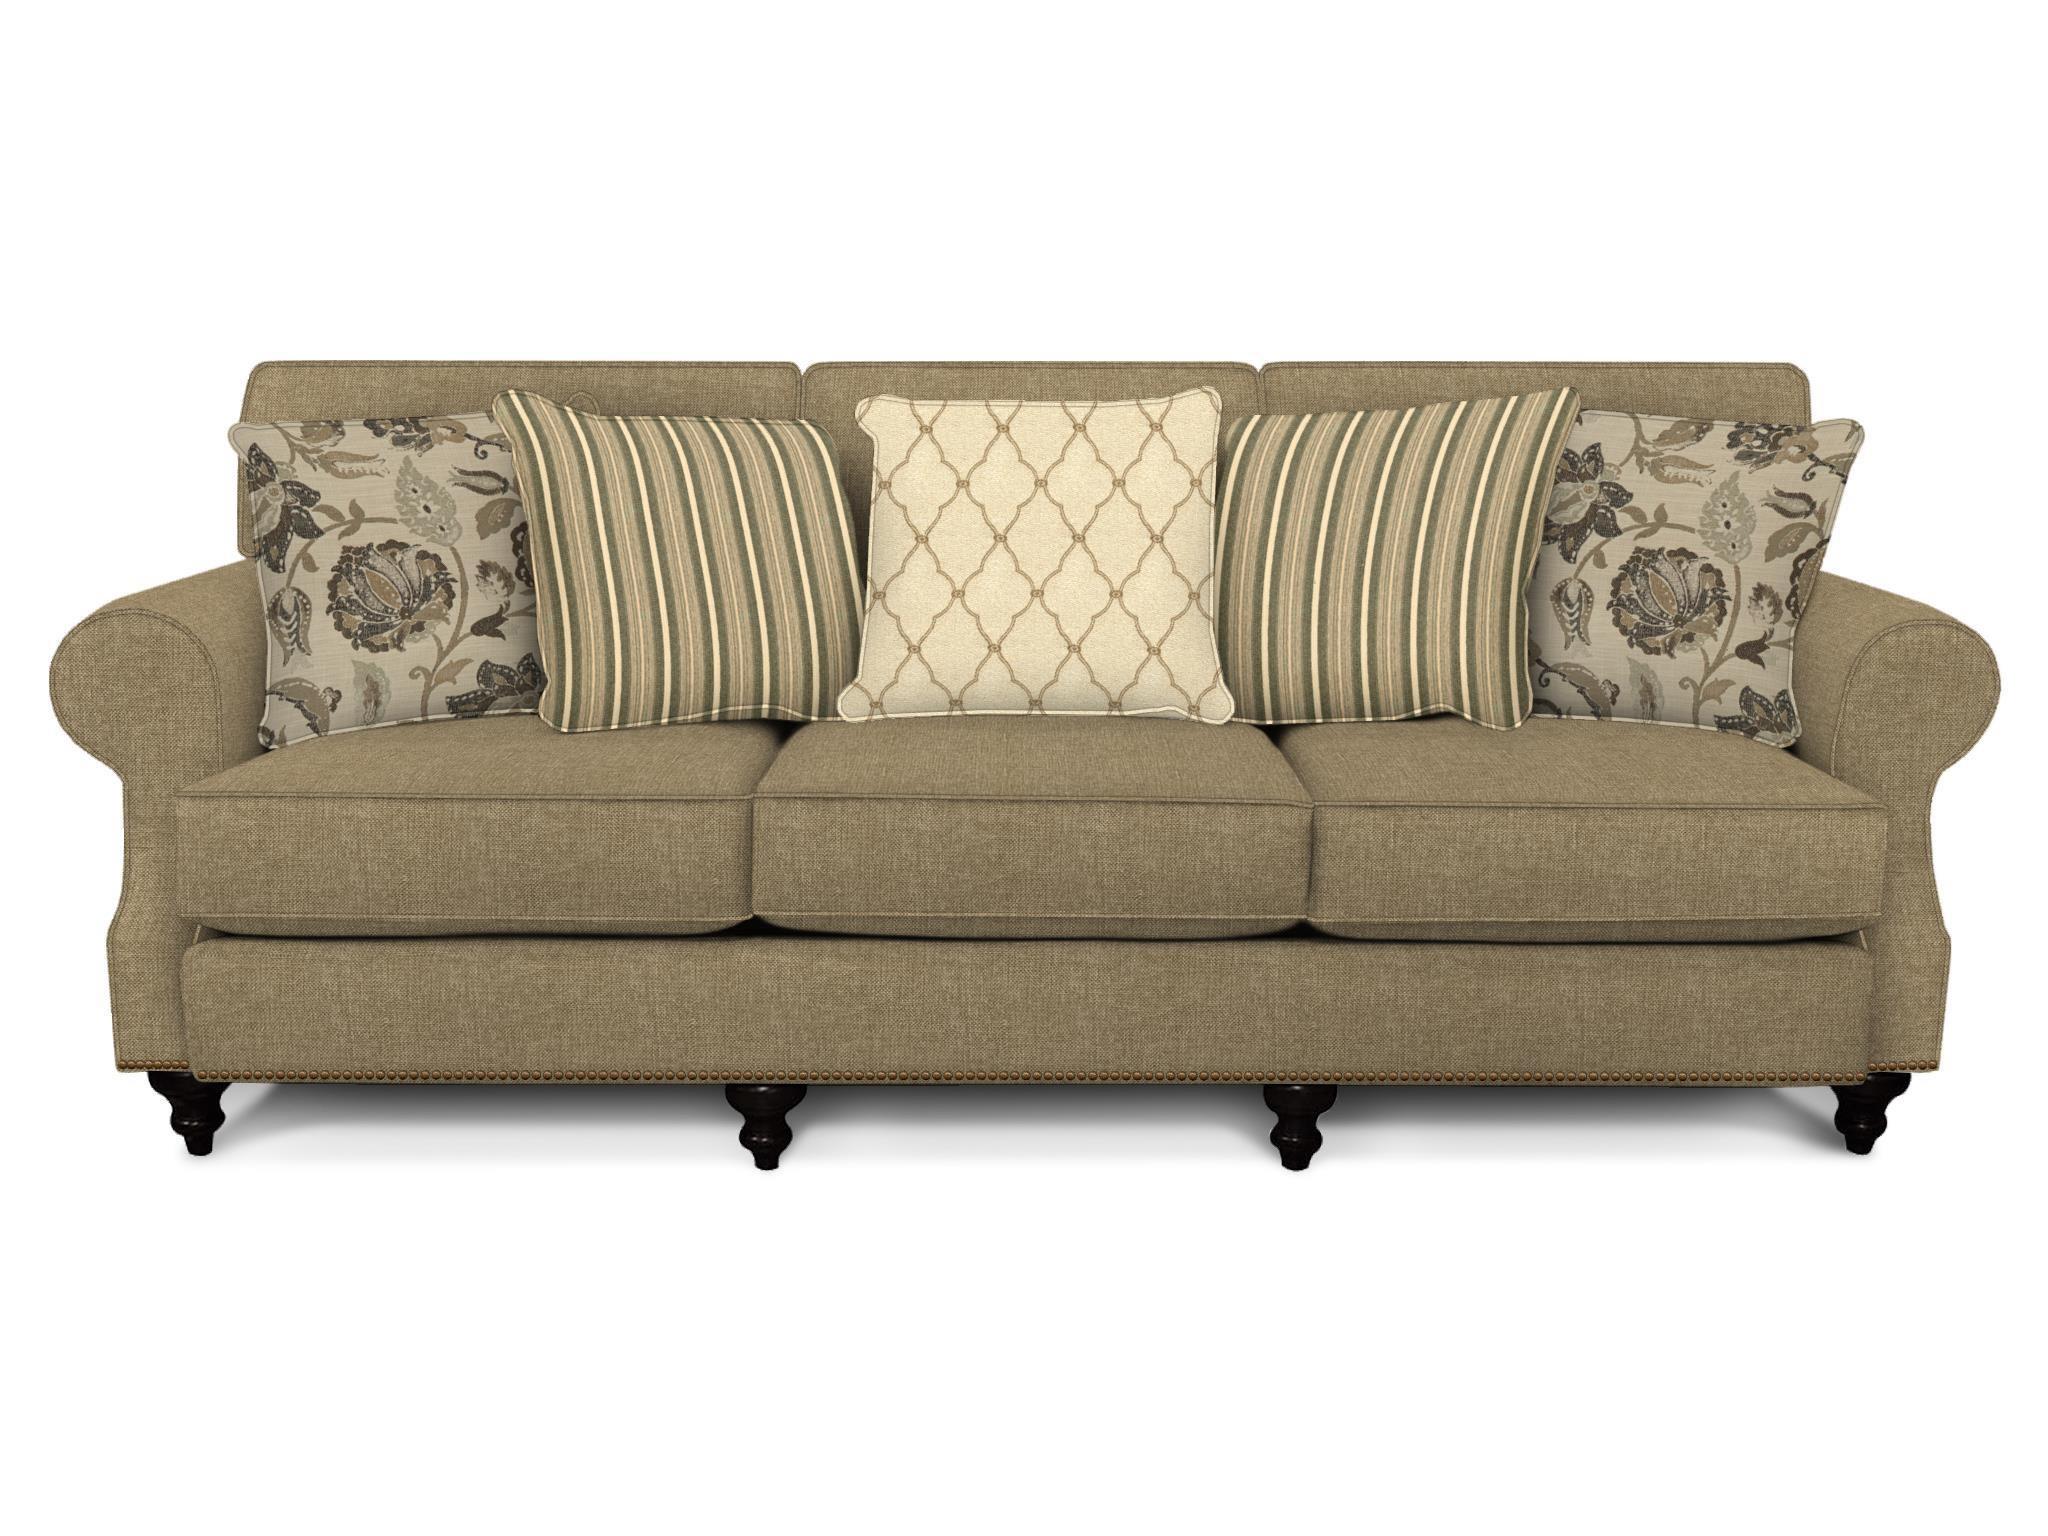 England Layla Sofa - Item Number: 5M05N GRANDE-PEWTER